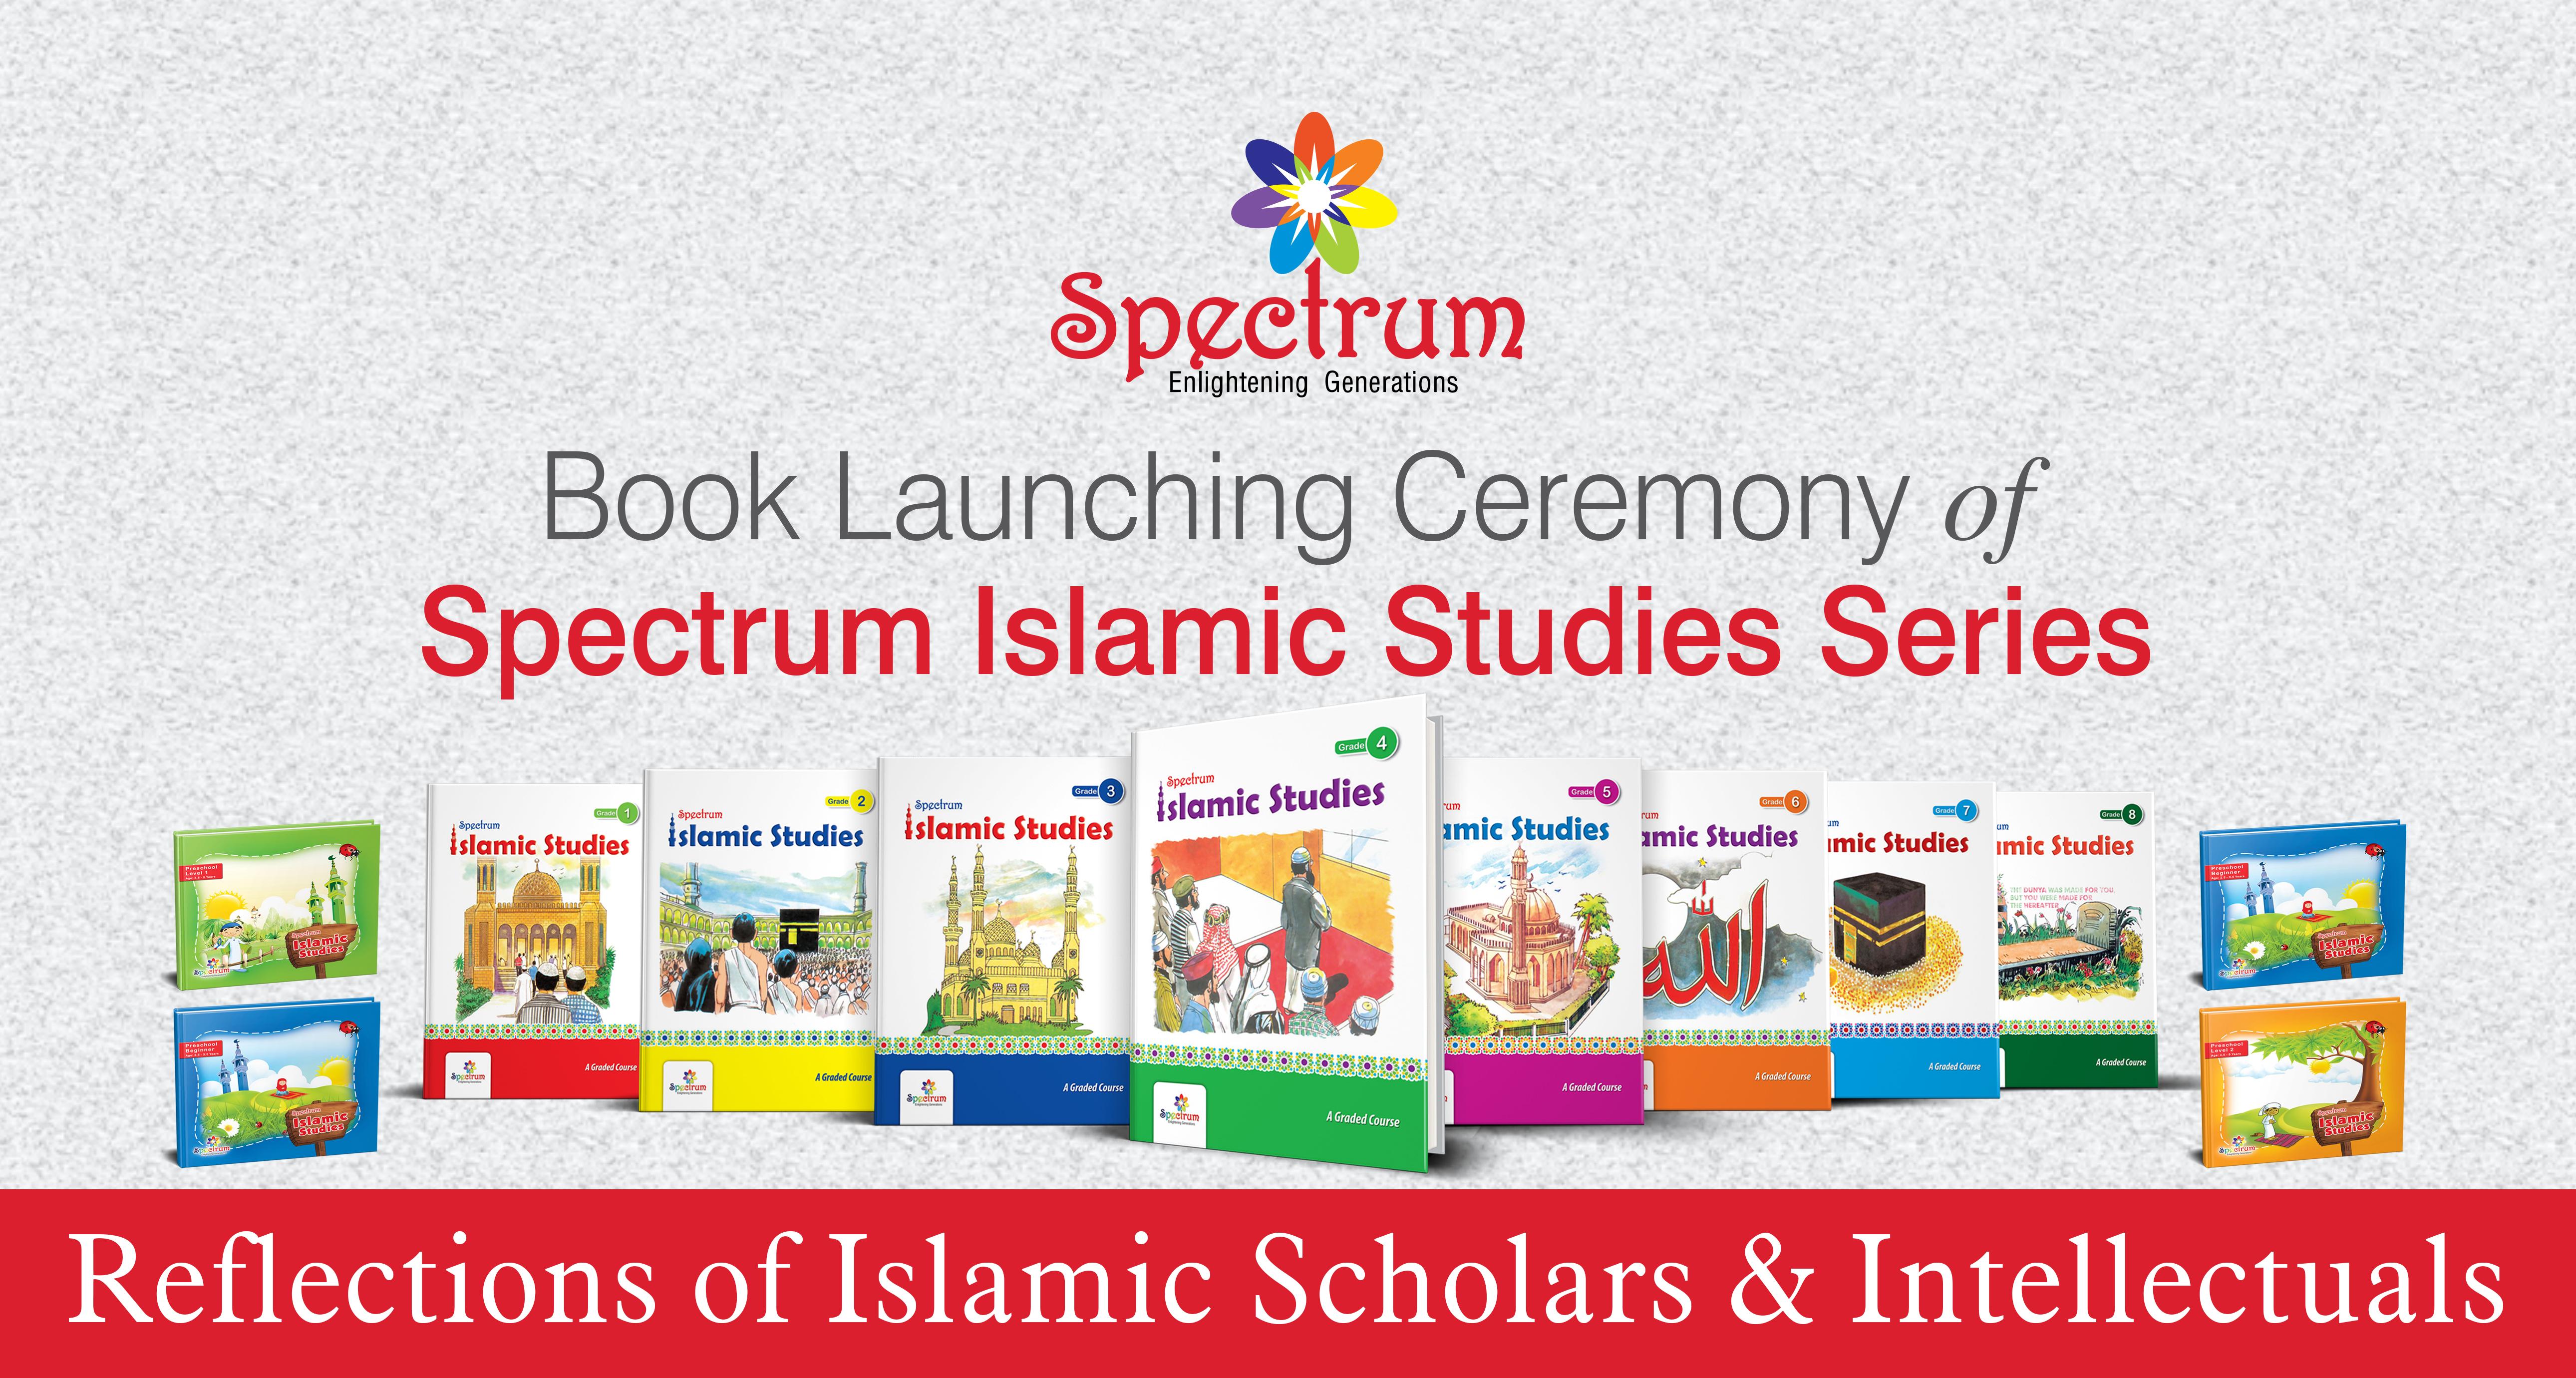 Reflections of Islamic Scholars & Intellectuals on Spectrum Islamic Studies